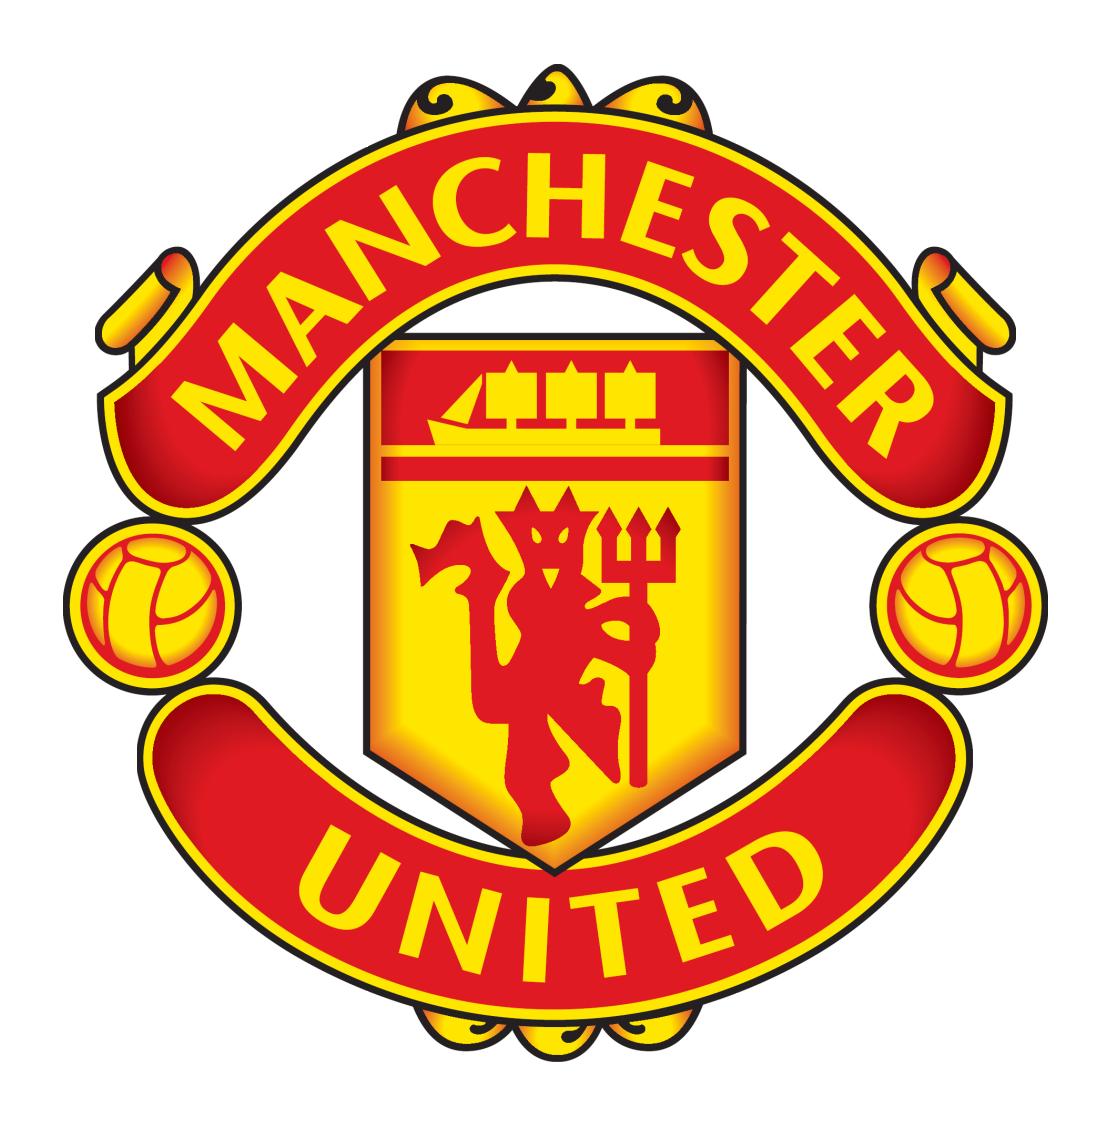 Эмблема ФК «Манчестер Юнайтед»